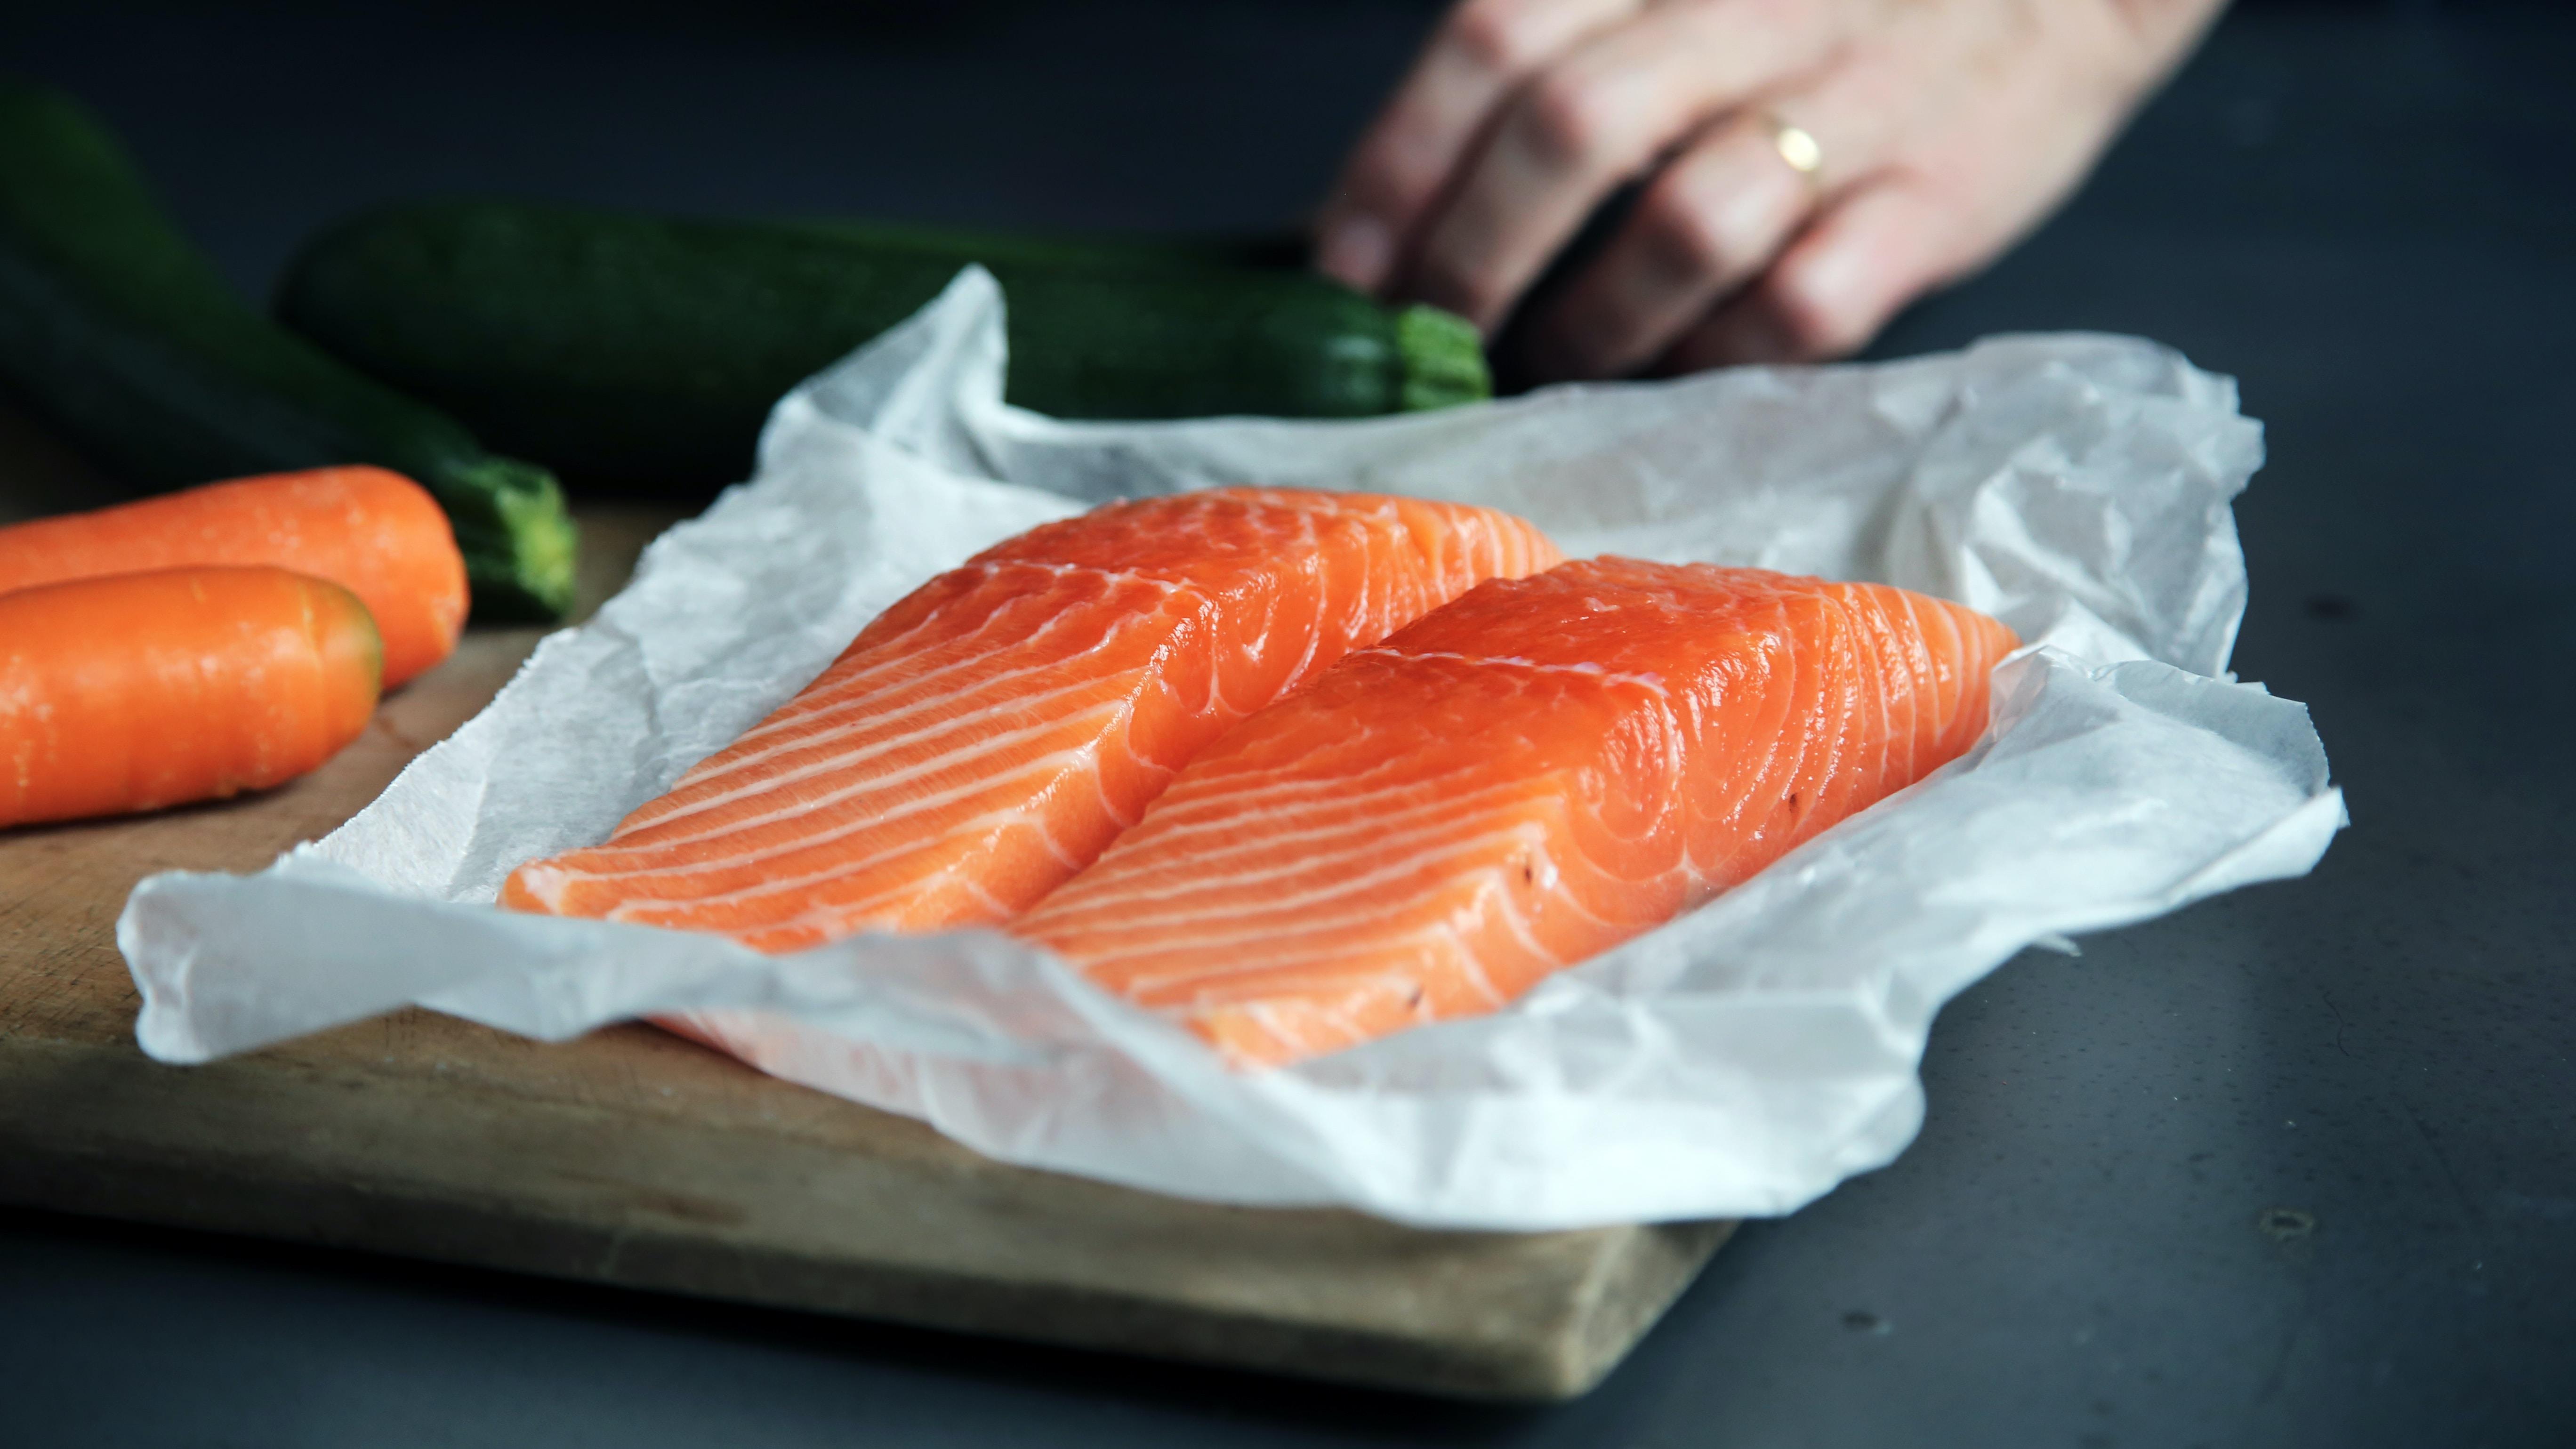 Foods good for skin: salmon